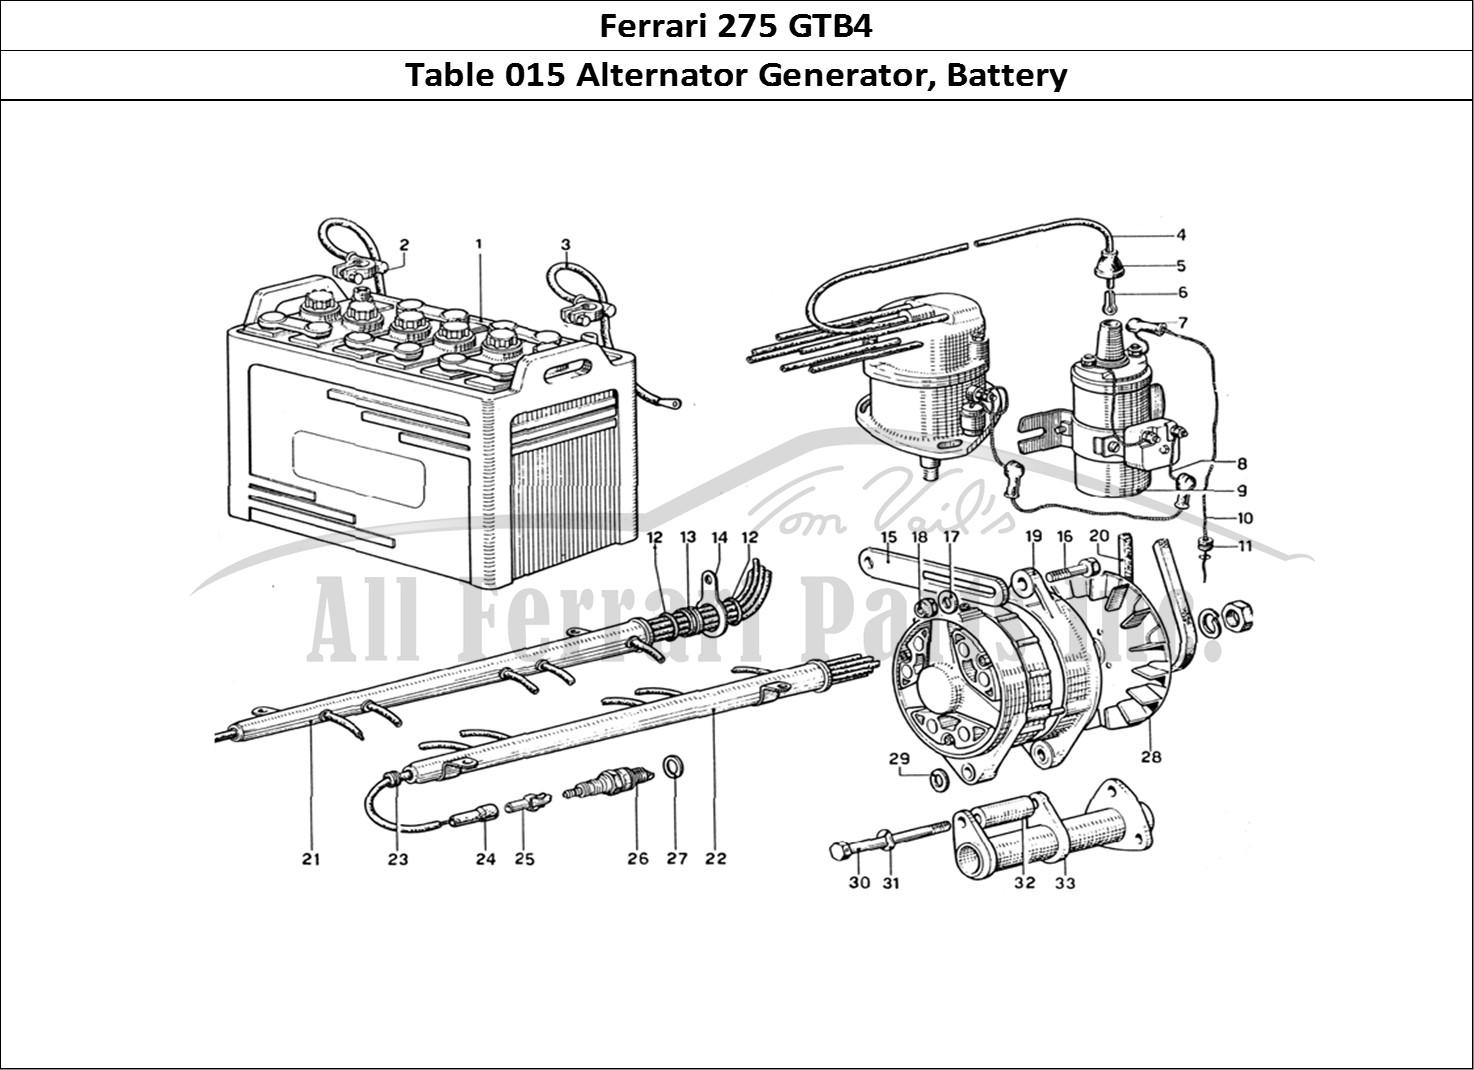 Buy original Ferrari 275 GTB4 015 Alternator Generator